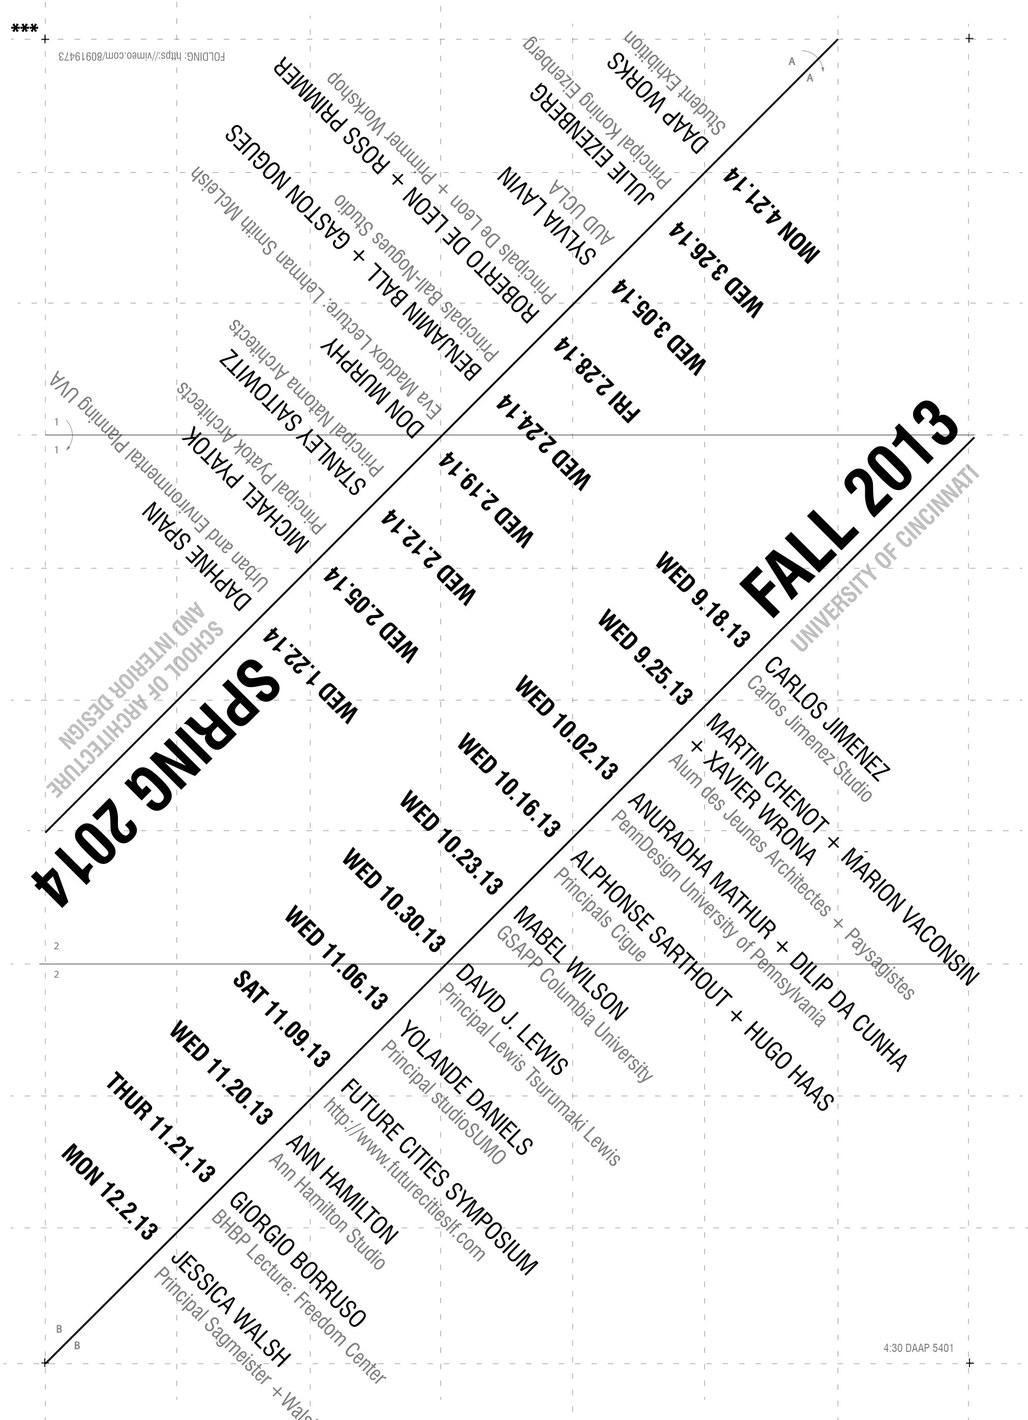 University of Cincinnati SAID Lecture Series. Image courtesy of U. Cincinnati SAID.